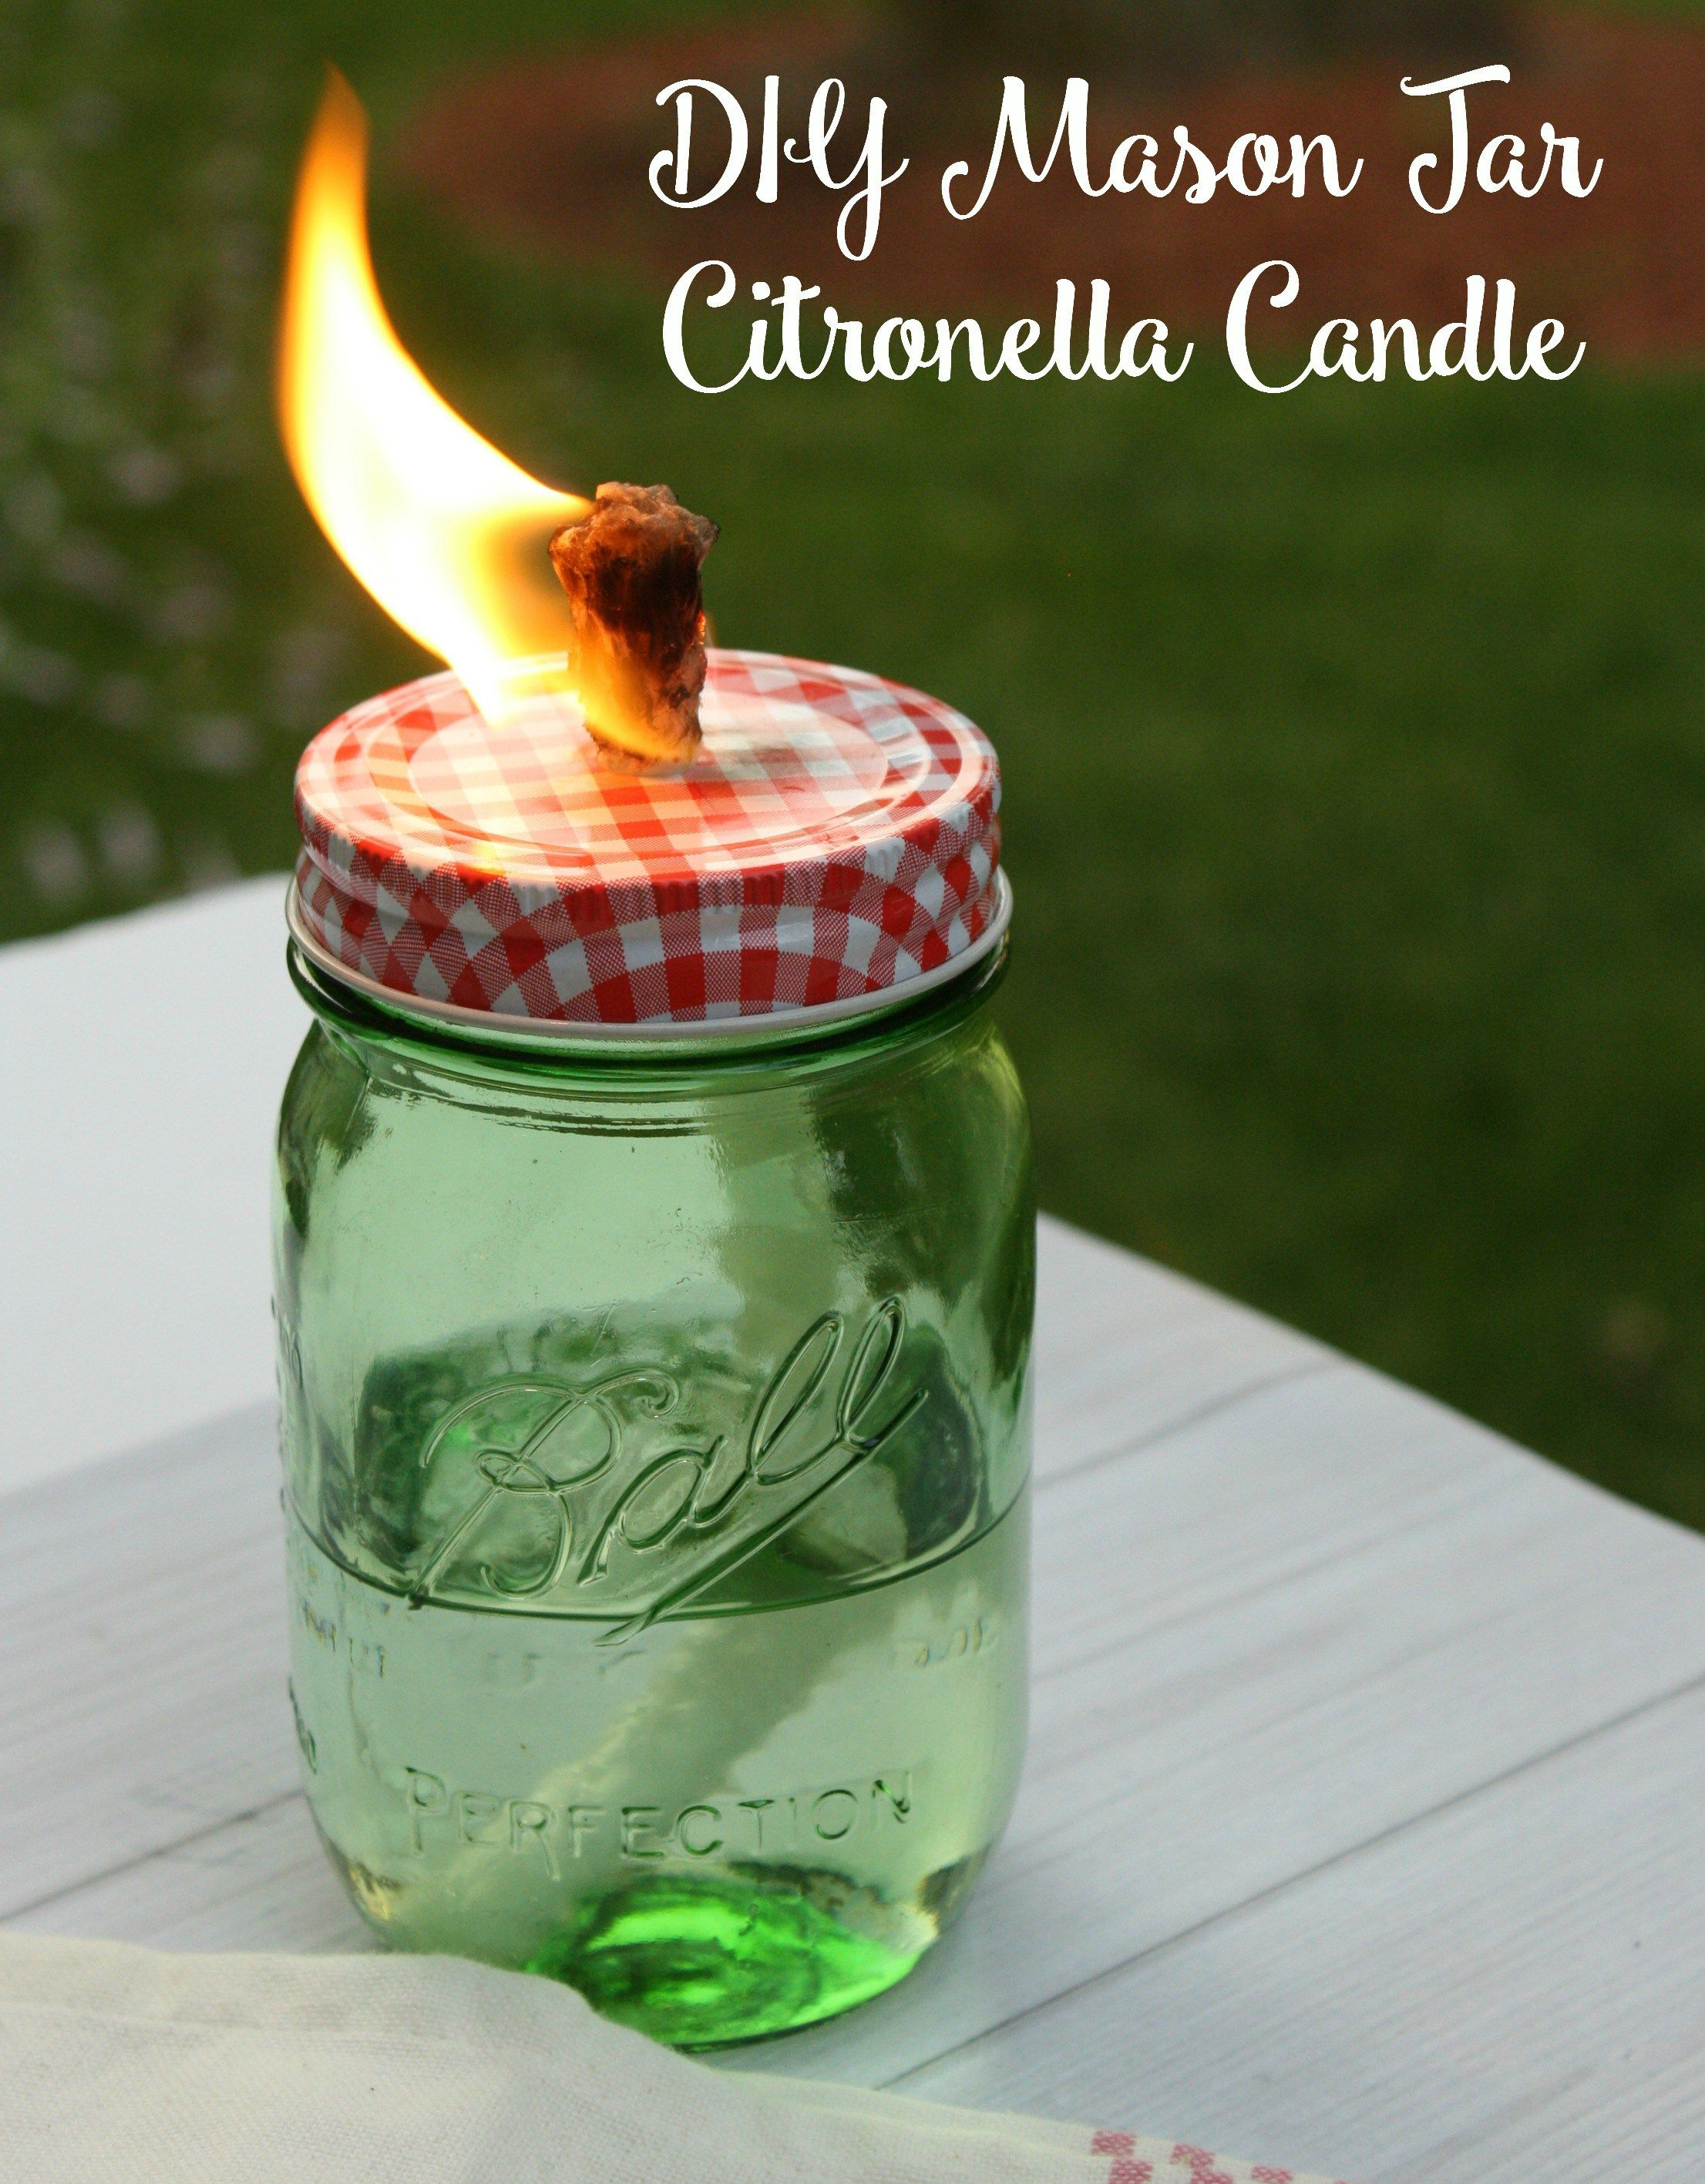 DIY Mason Jar Citronella Candle DIY Mason